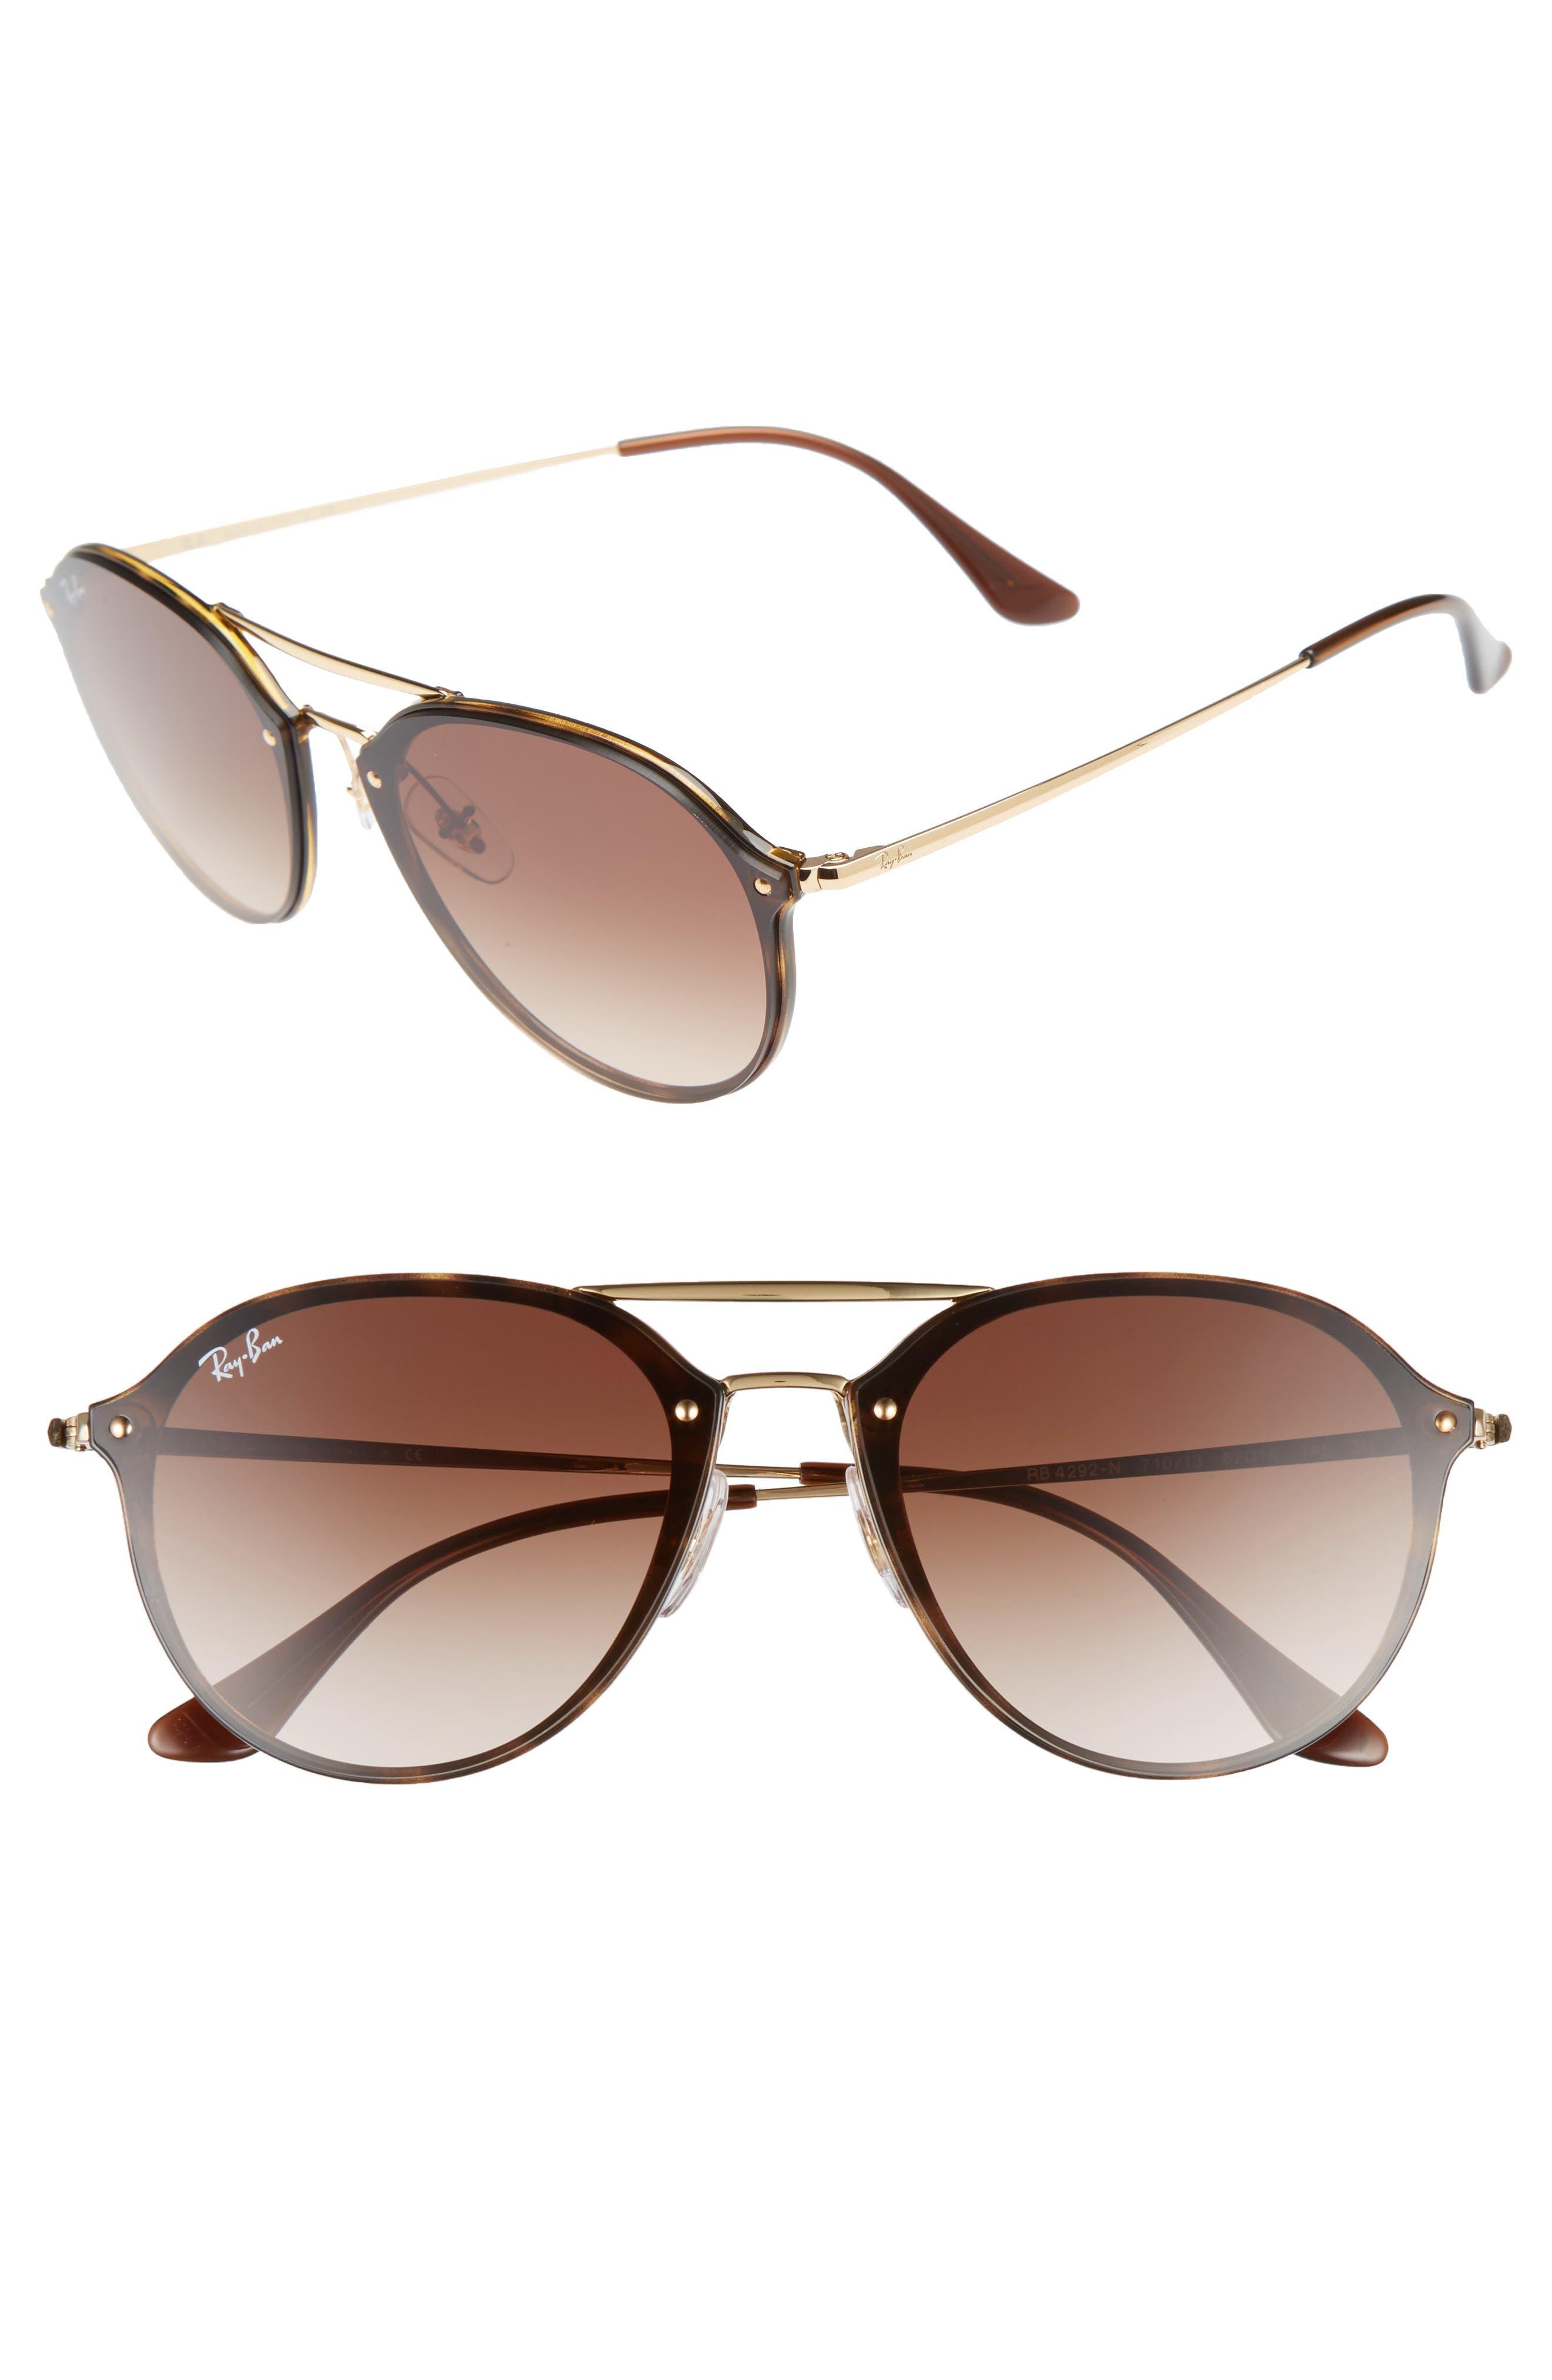 Ray-Ban 62Mm Gradient Lens Aviator Sunglasses - Havana